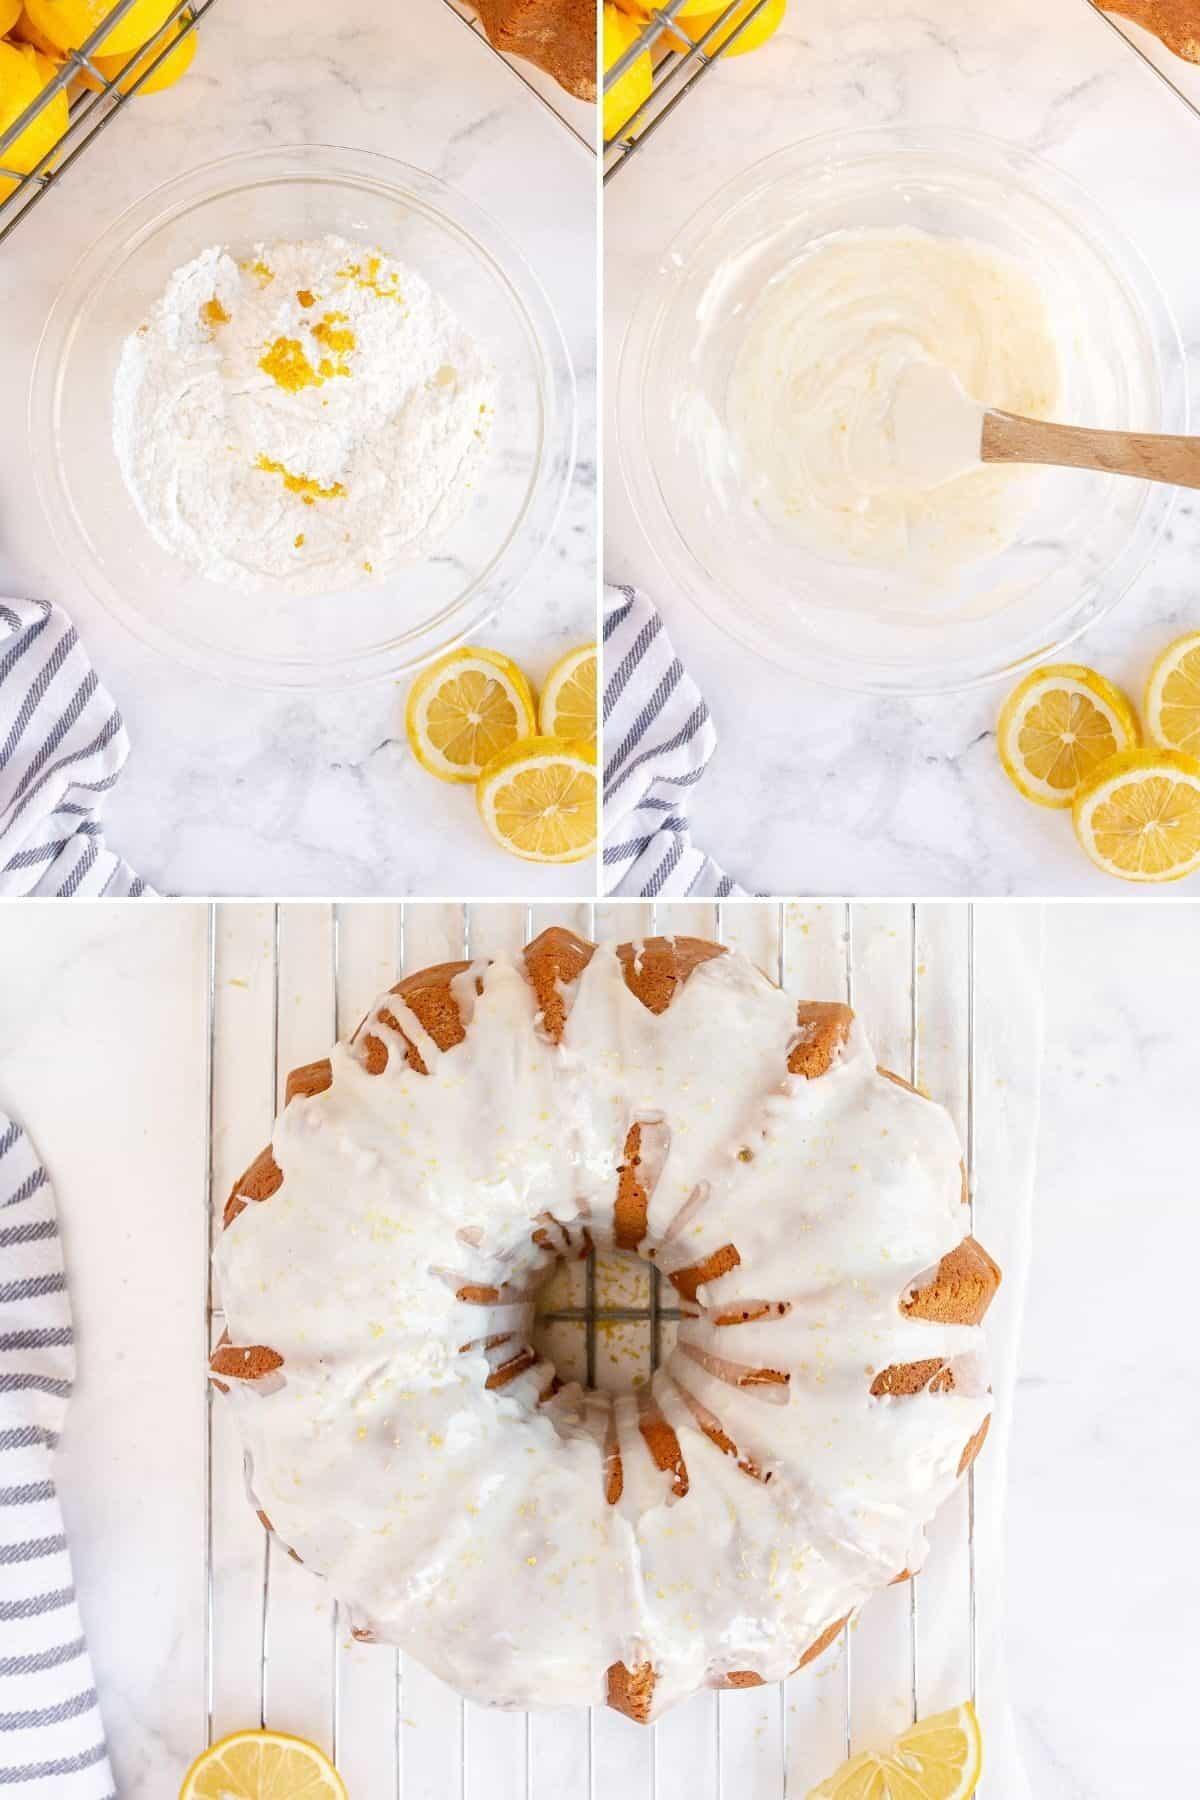 step by step photos showing how to make a lemon glaze for a cake